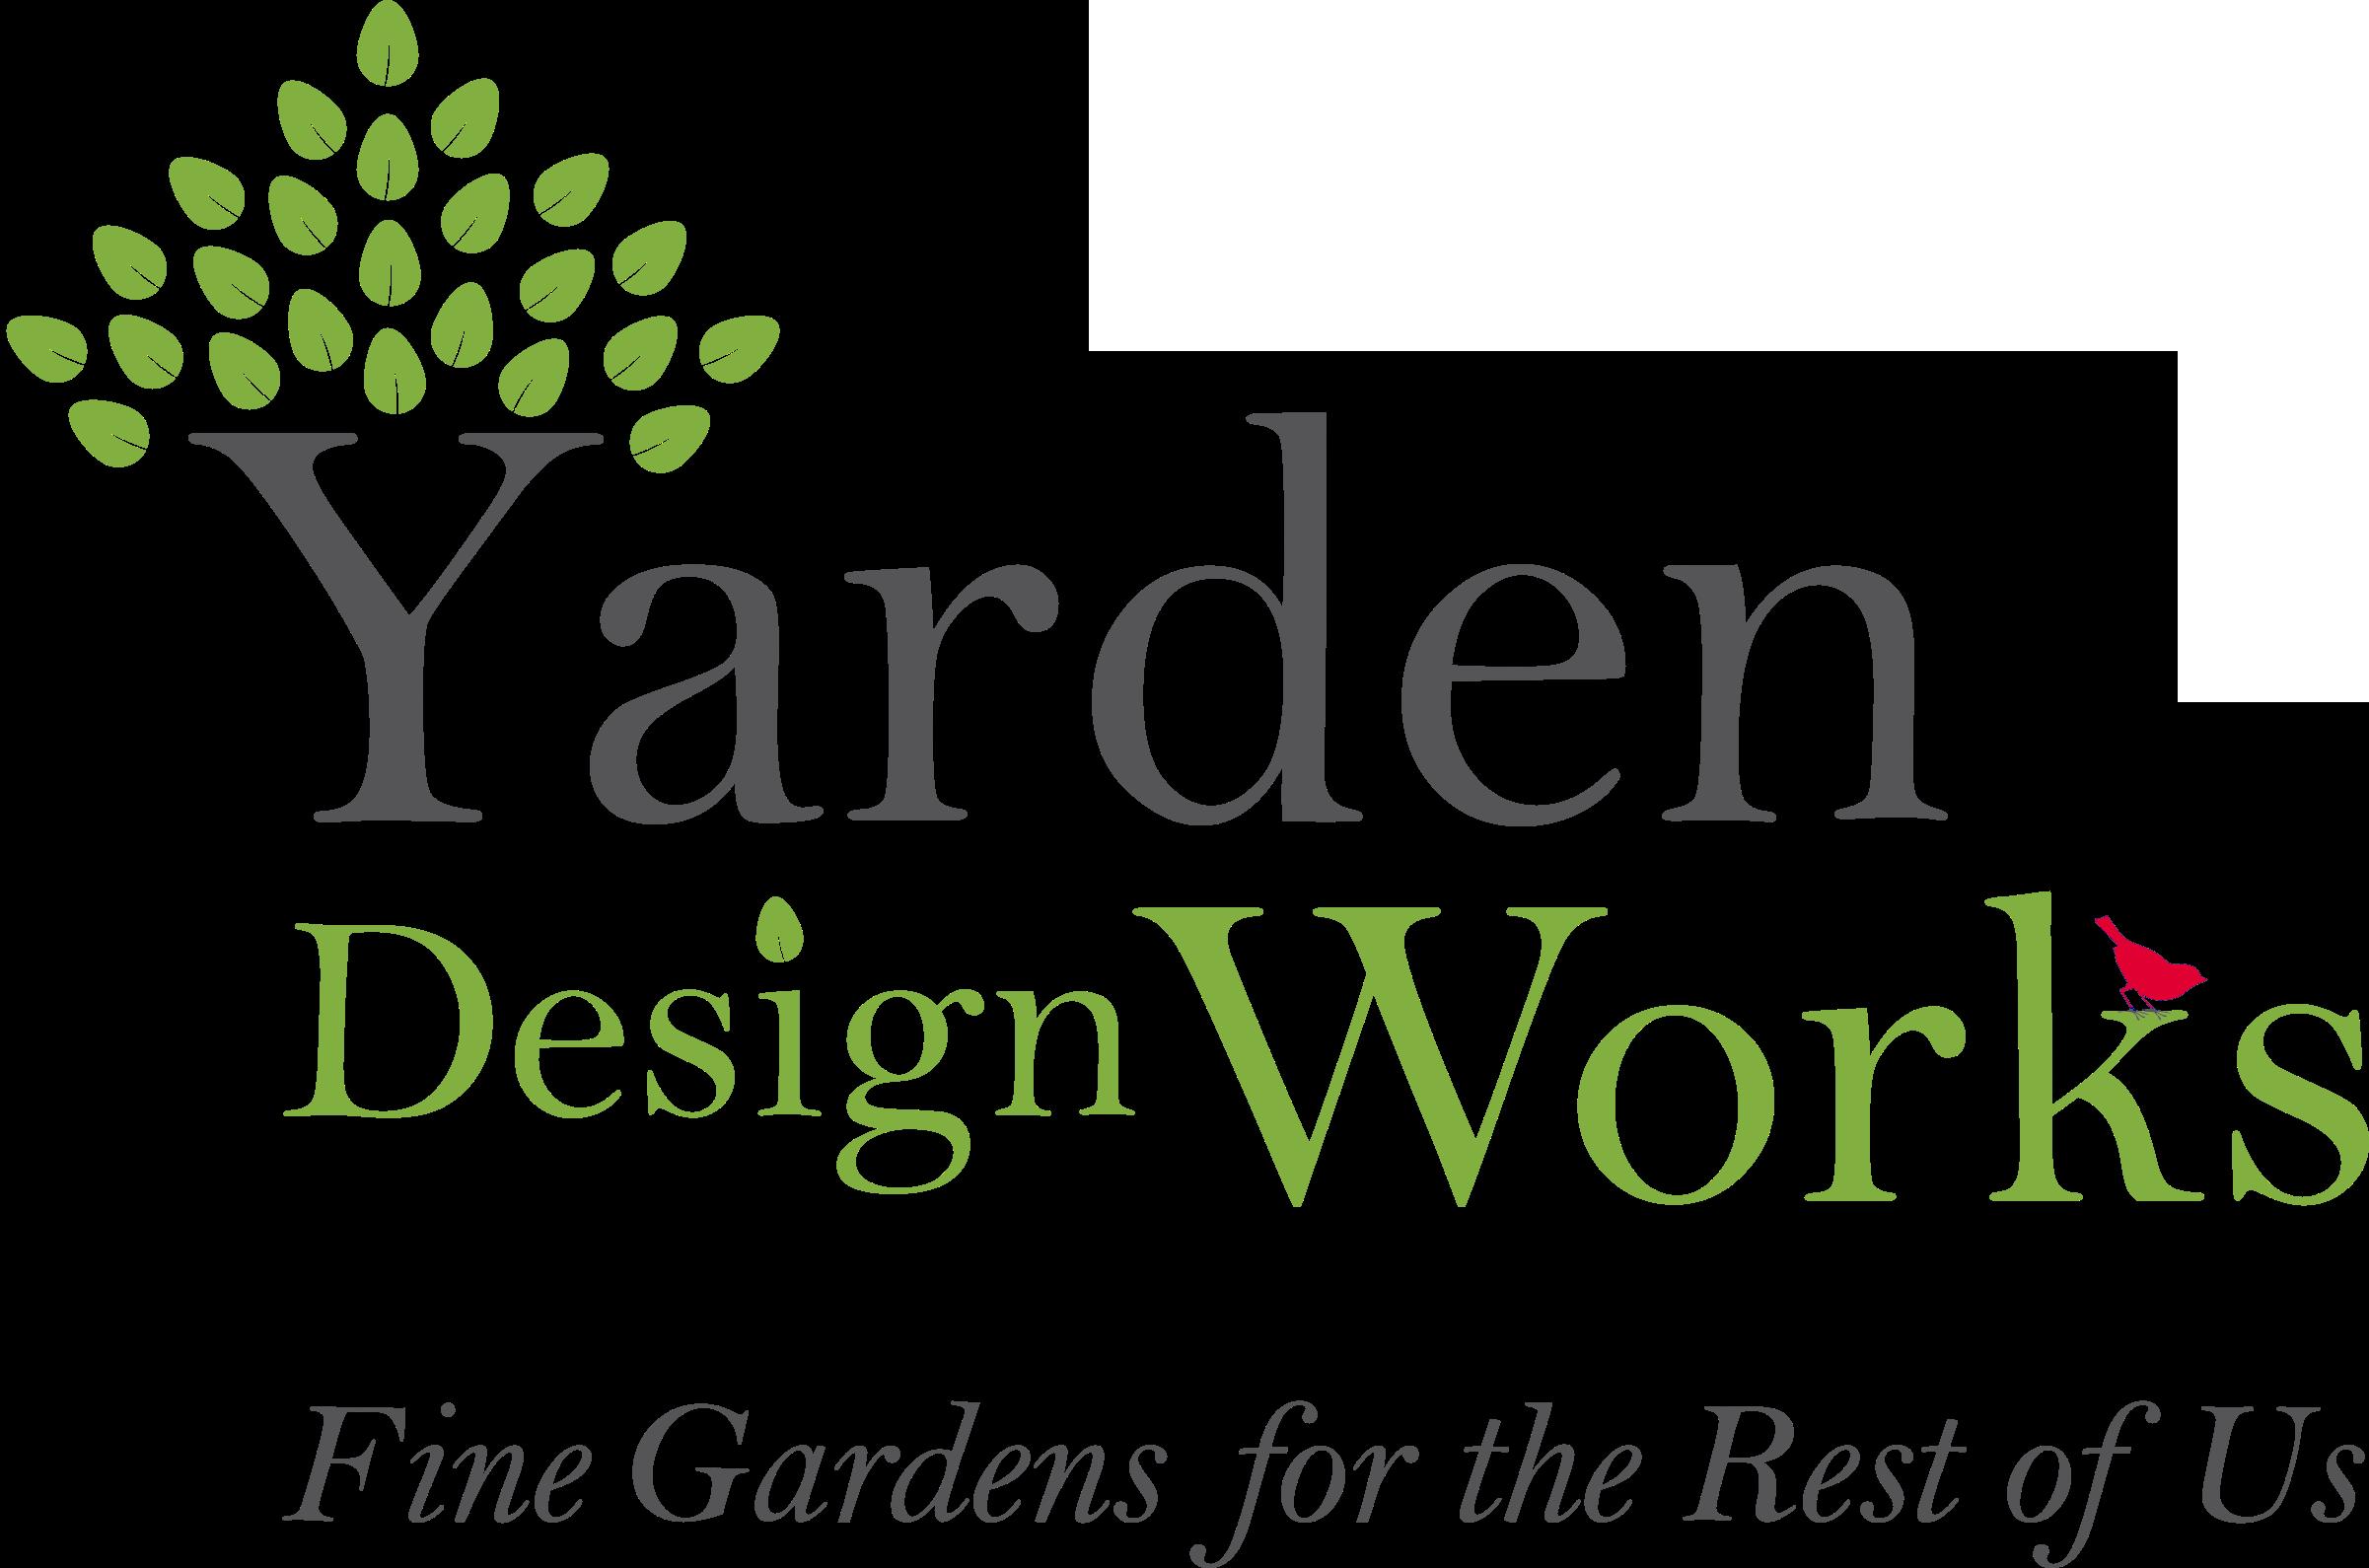 YardenDesignWorksRedBird.png